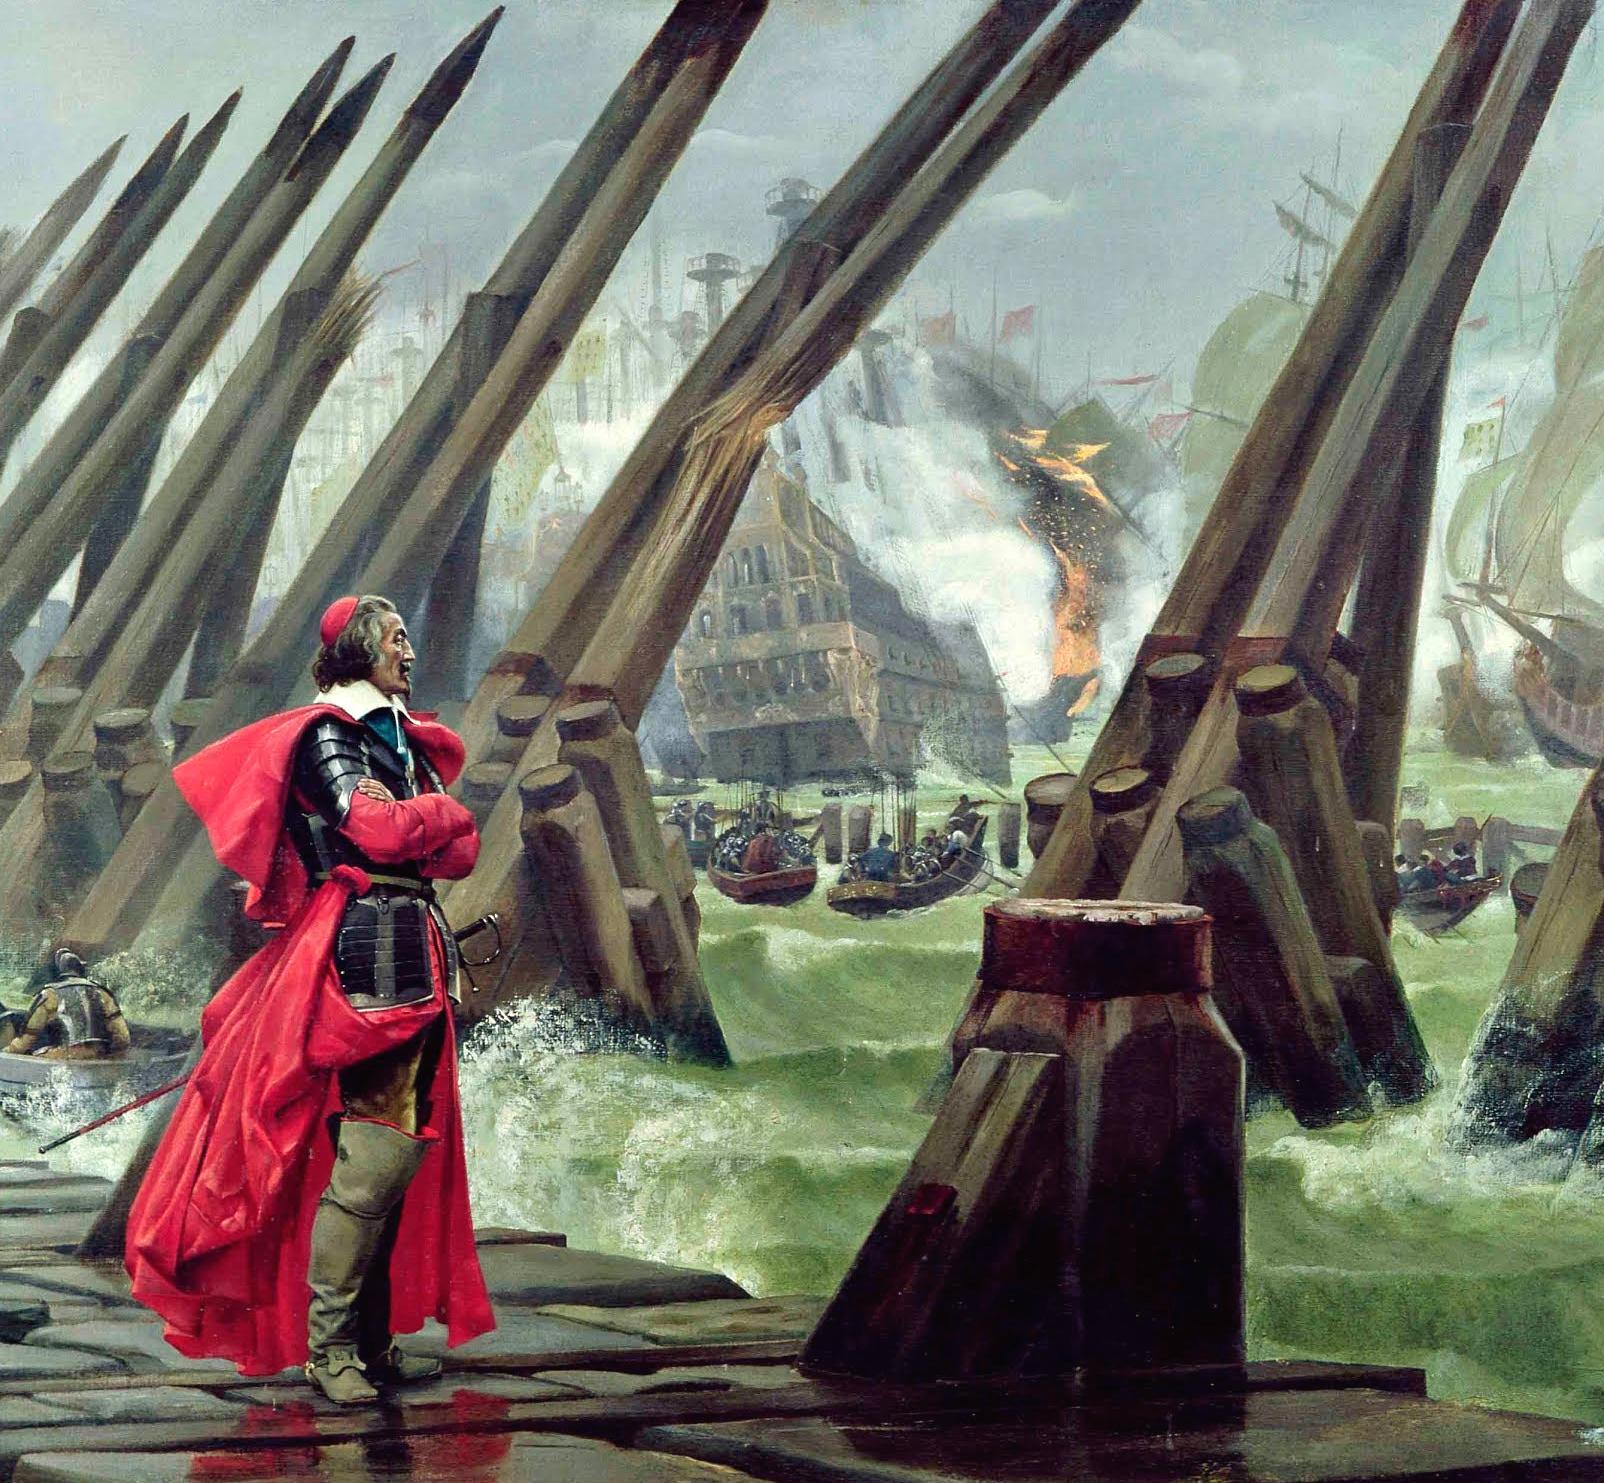 FK nambah musuh nih RichelieuRochelle